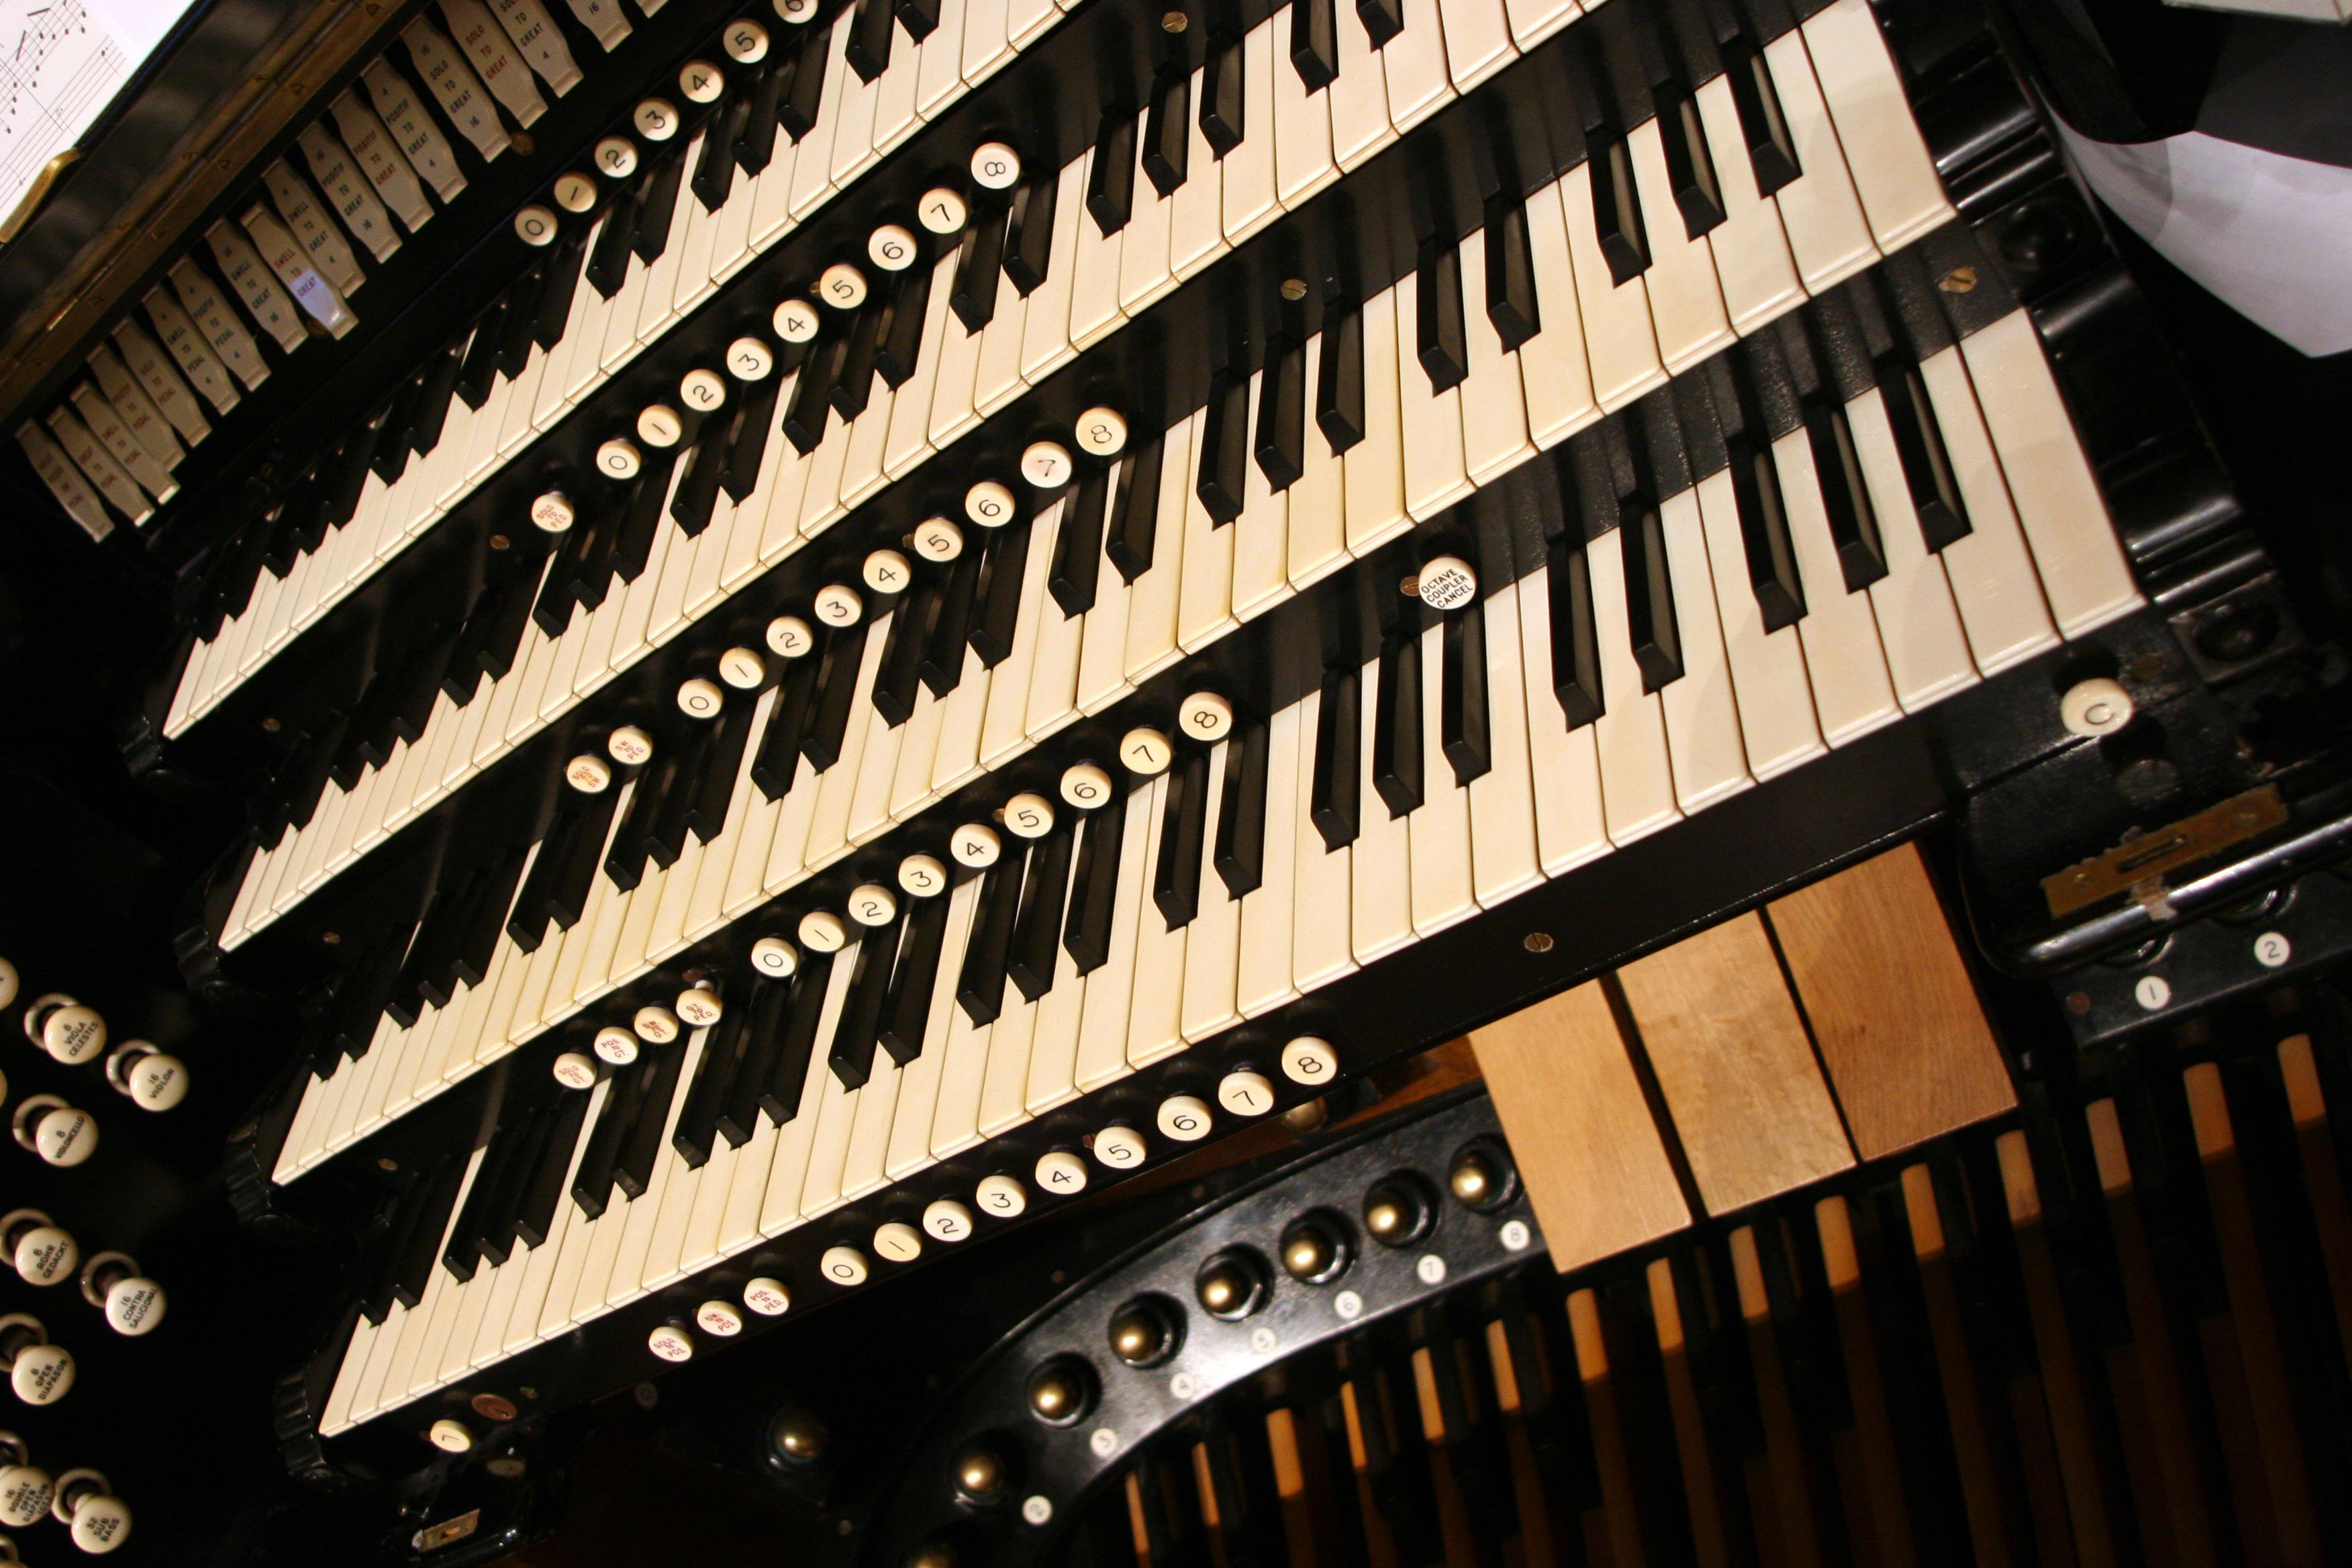 Close-up of the keys of the Brangwyn Hall Willis Organ